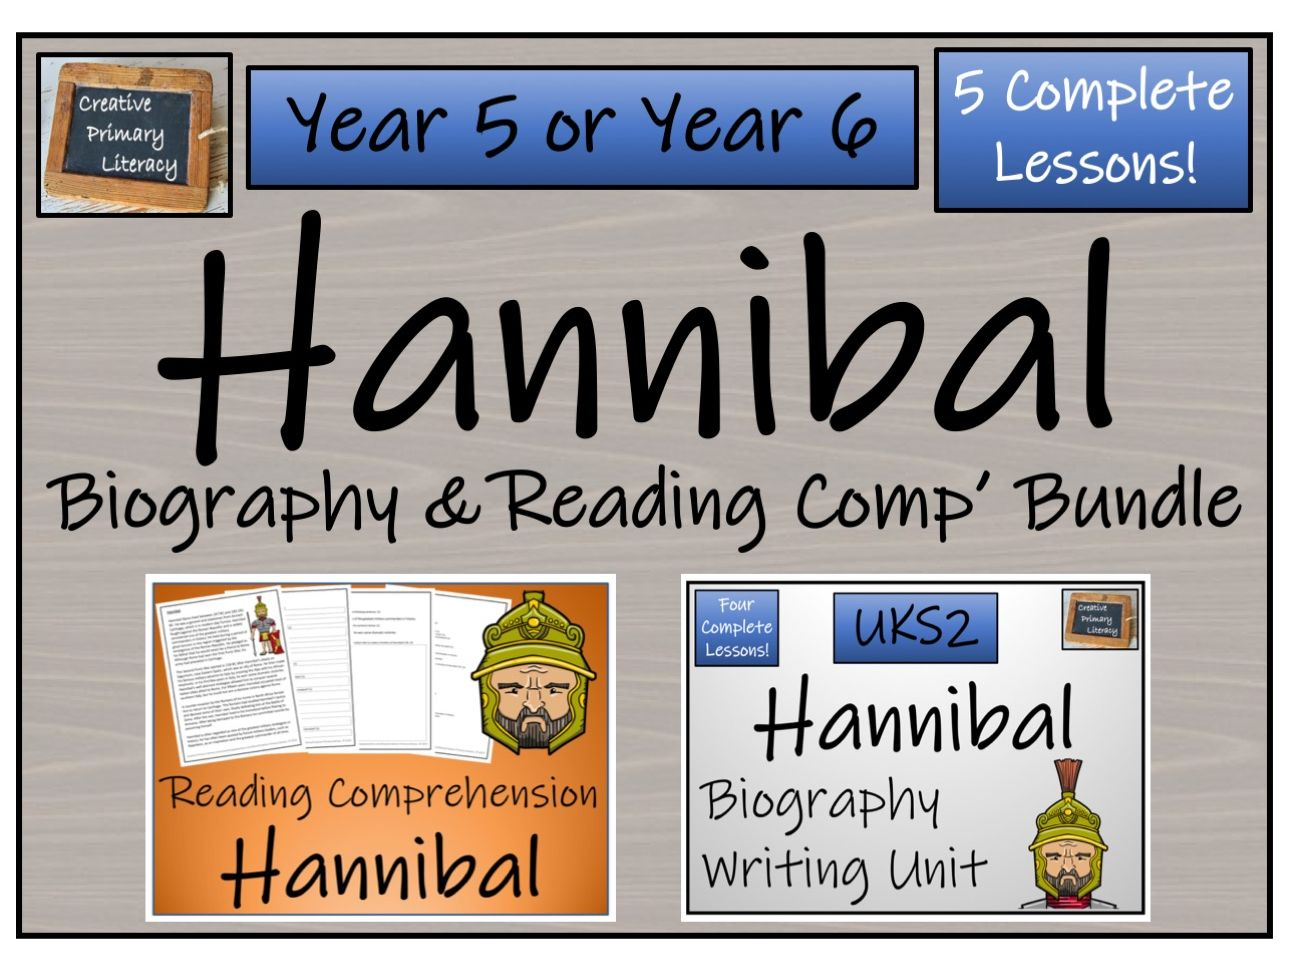 UKS2 History - Hannibal Reading Comprehension & Biography Bundle